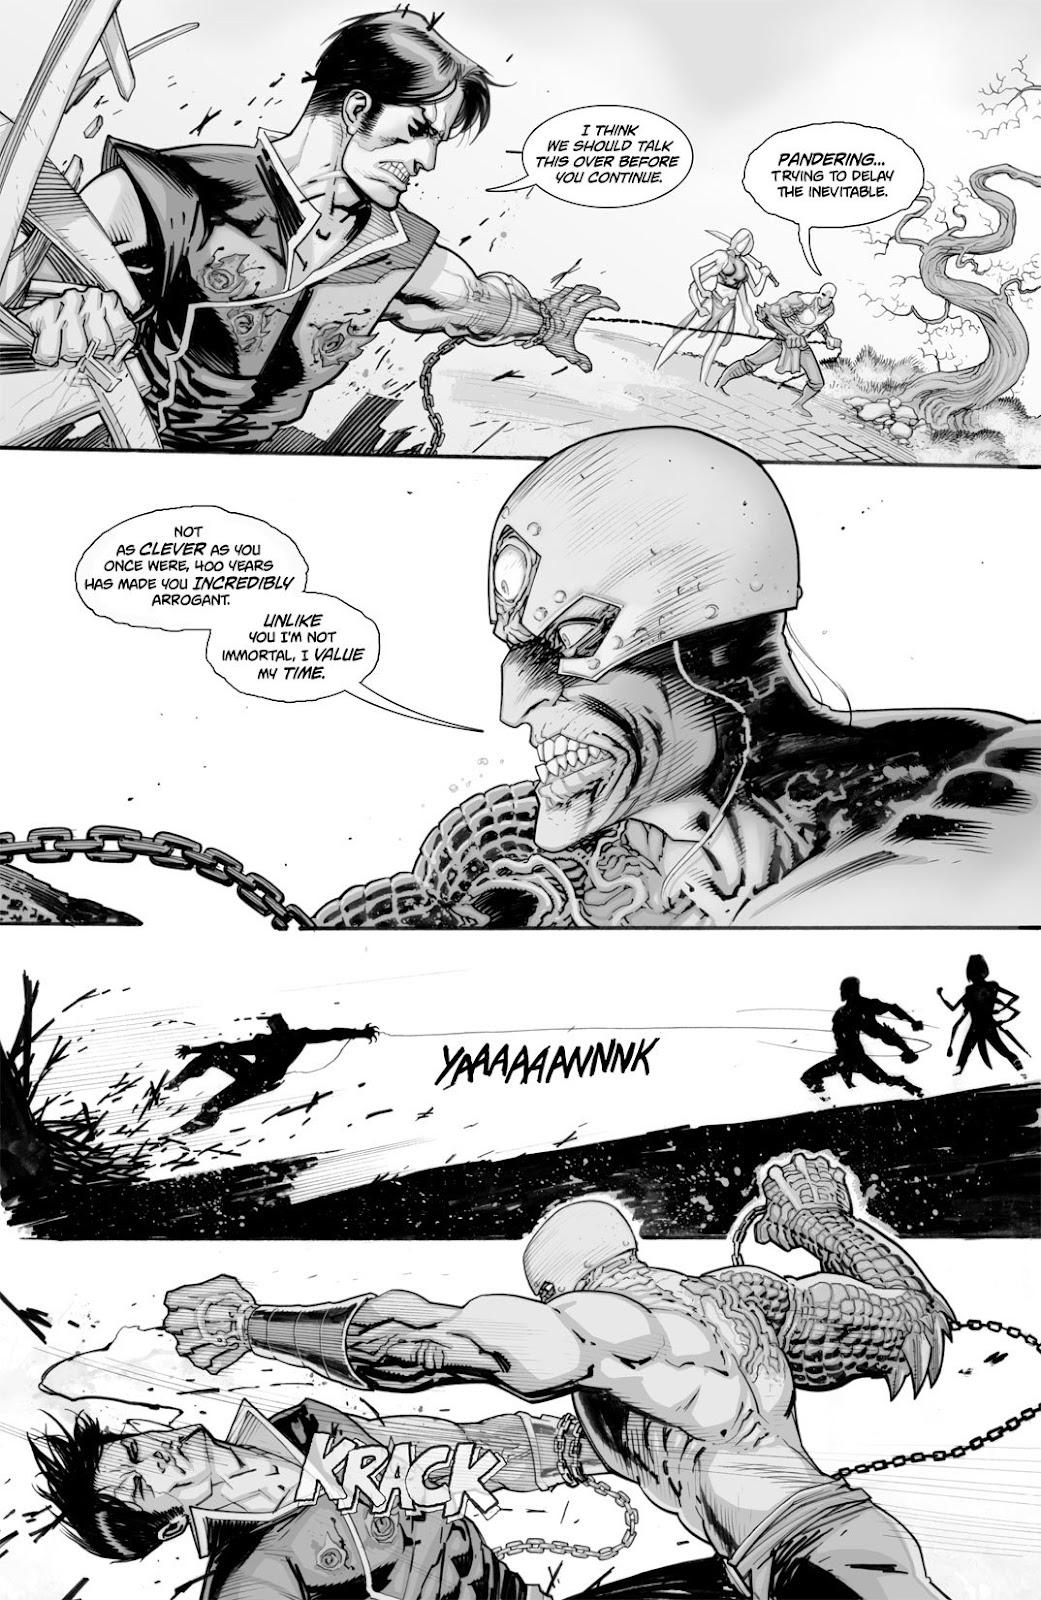 Read online Reaper comic -  Issue #2 - 29